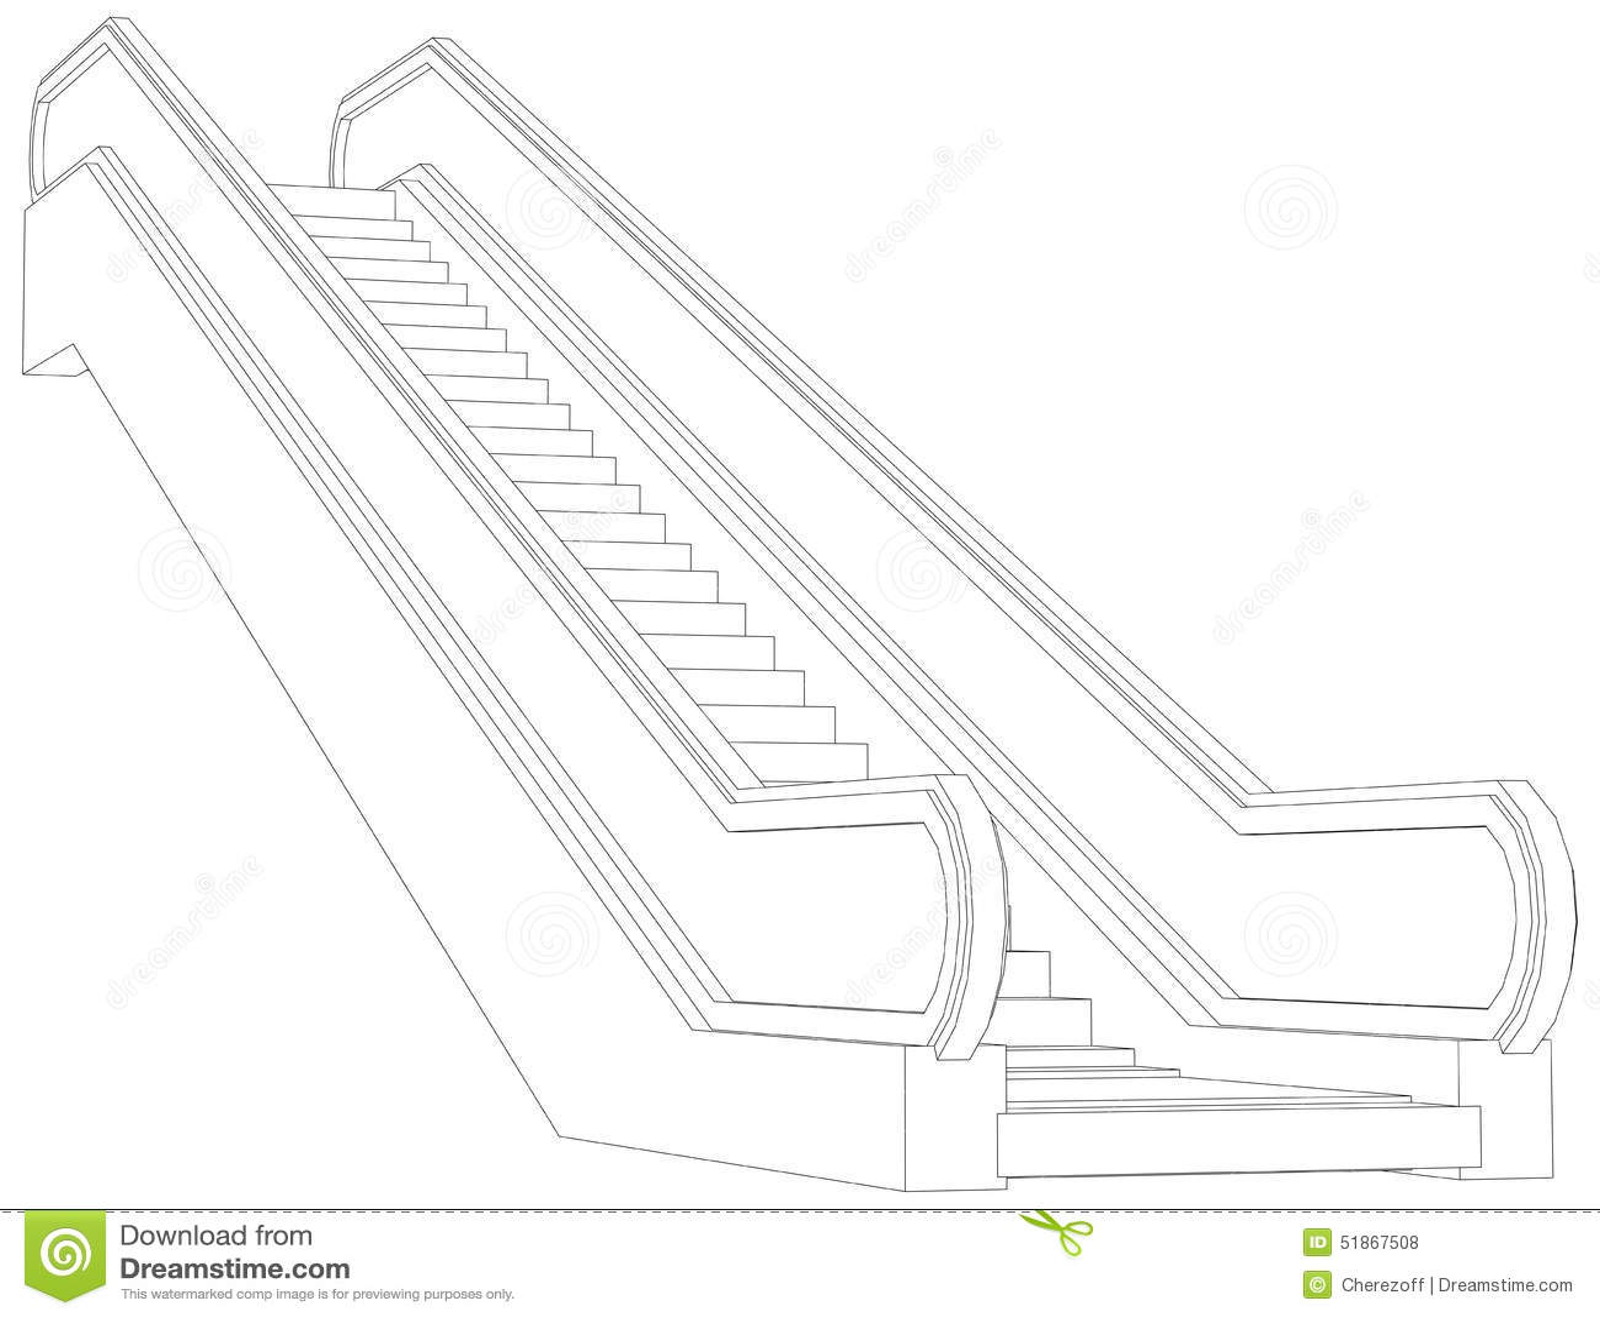 Sketch Of Escalator Vector Illustration Stock Vector